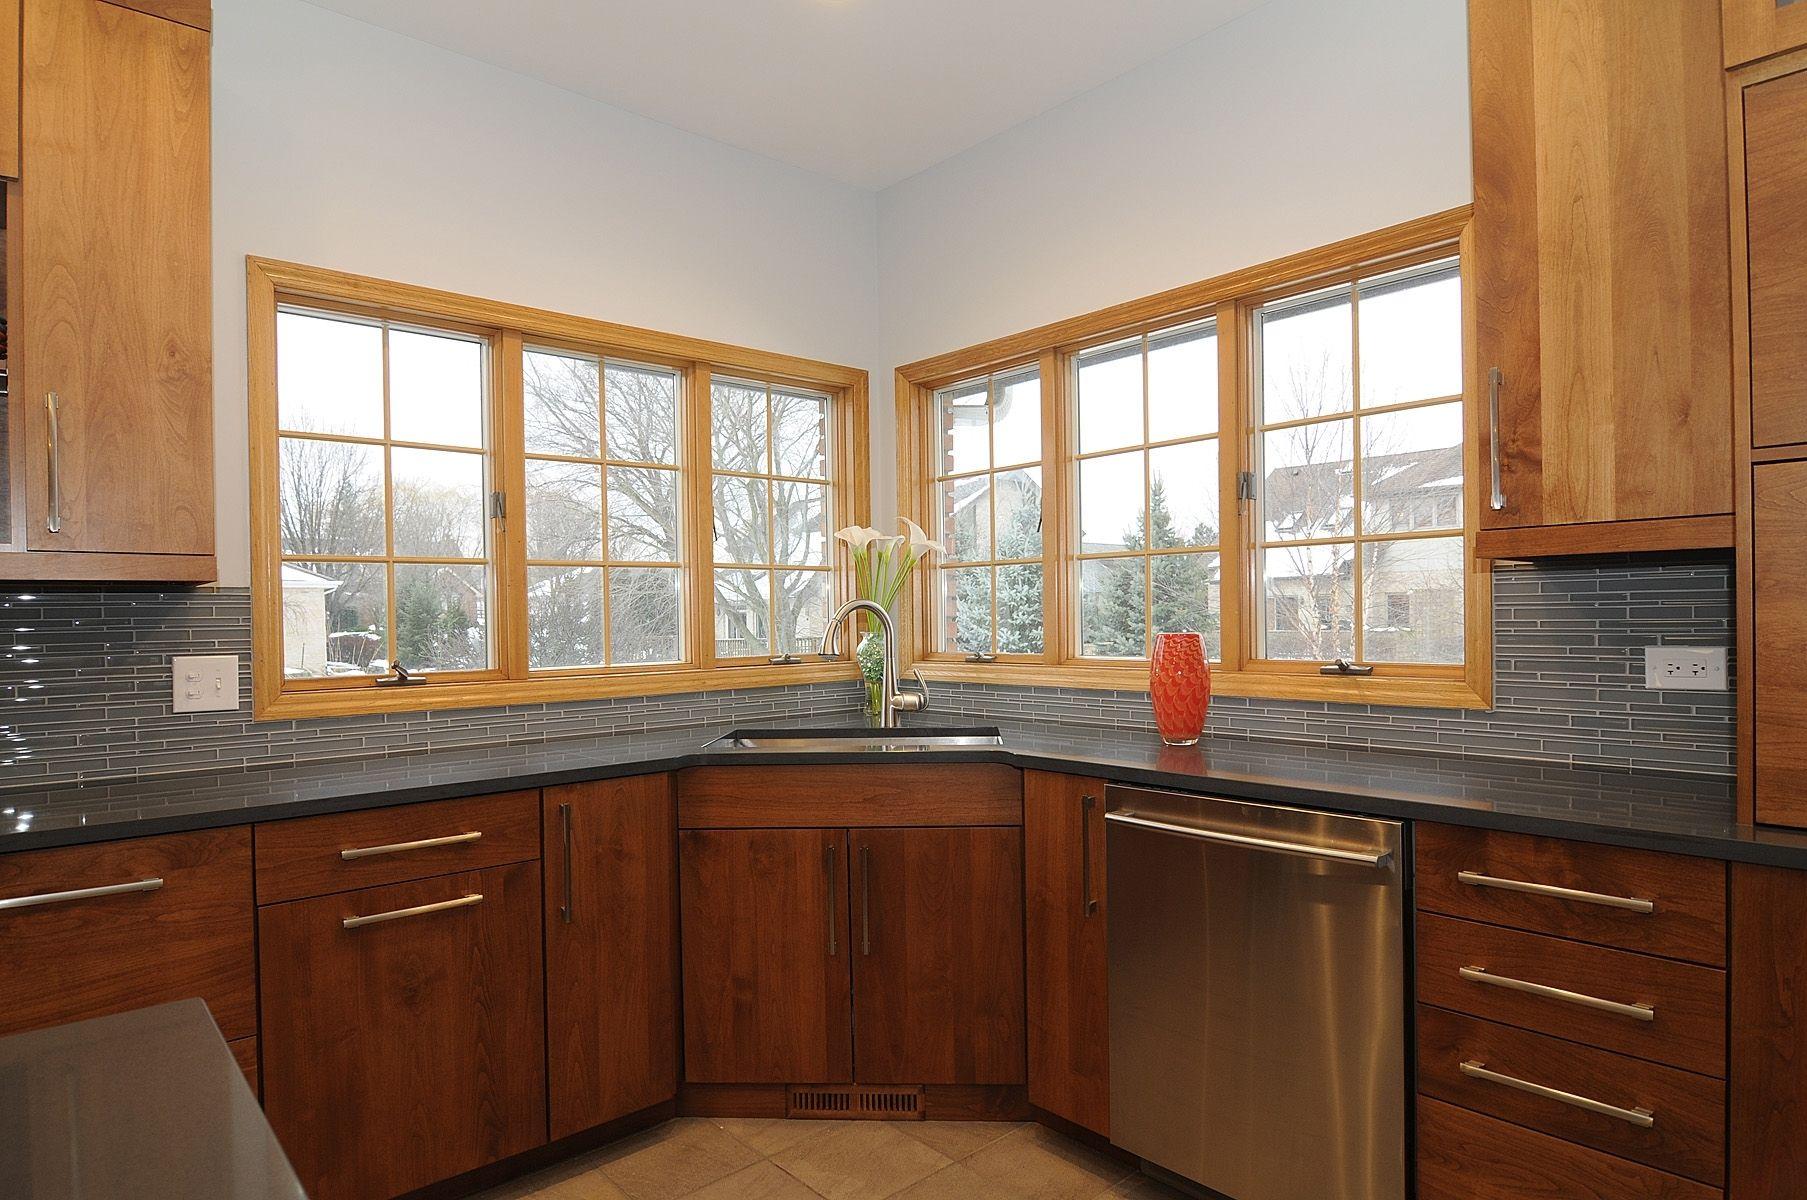 Amish Kitchen Cabinets Southern Illinois